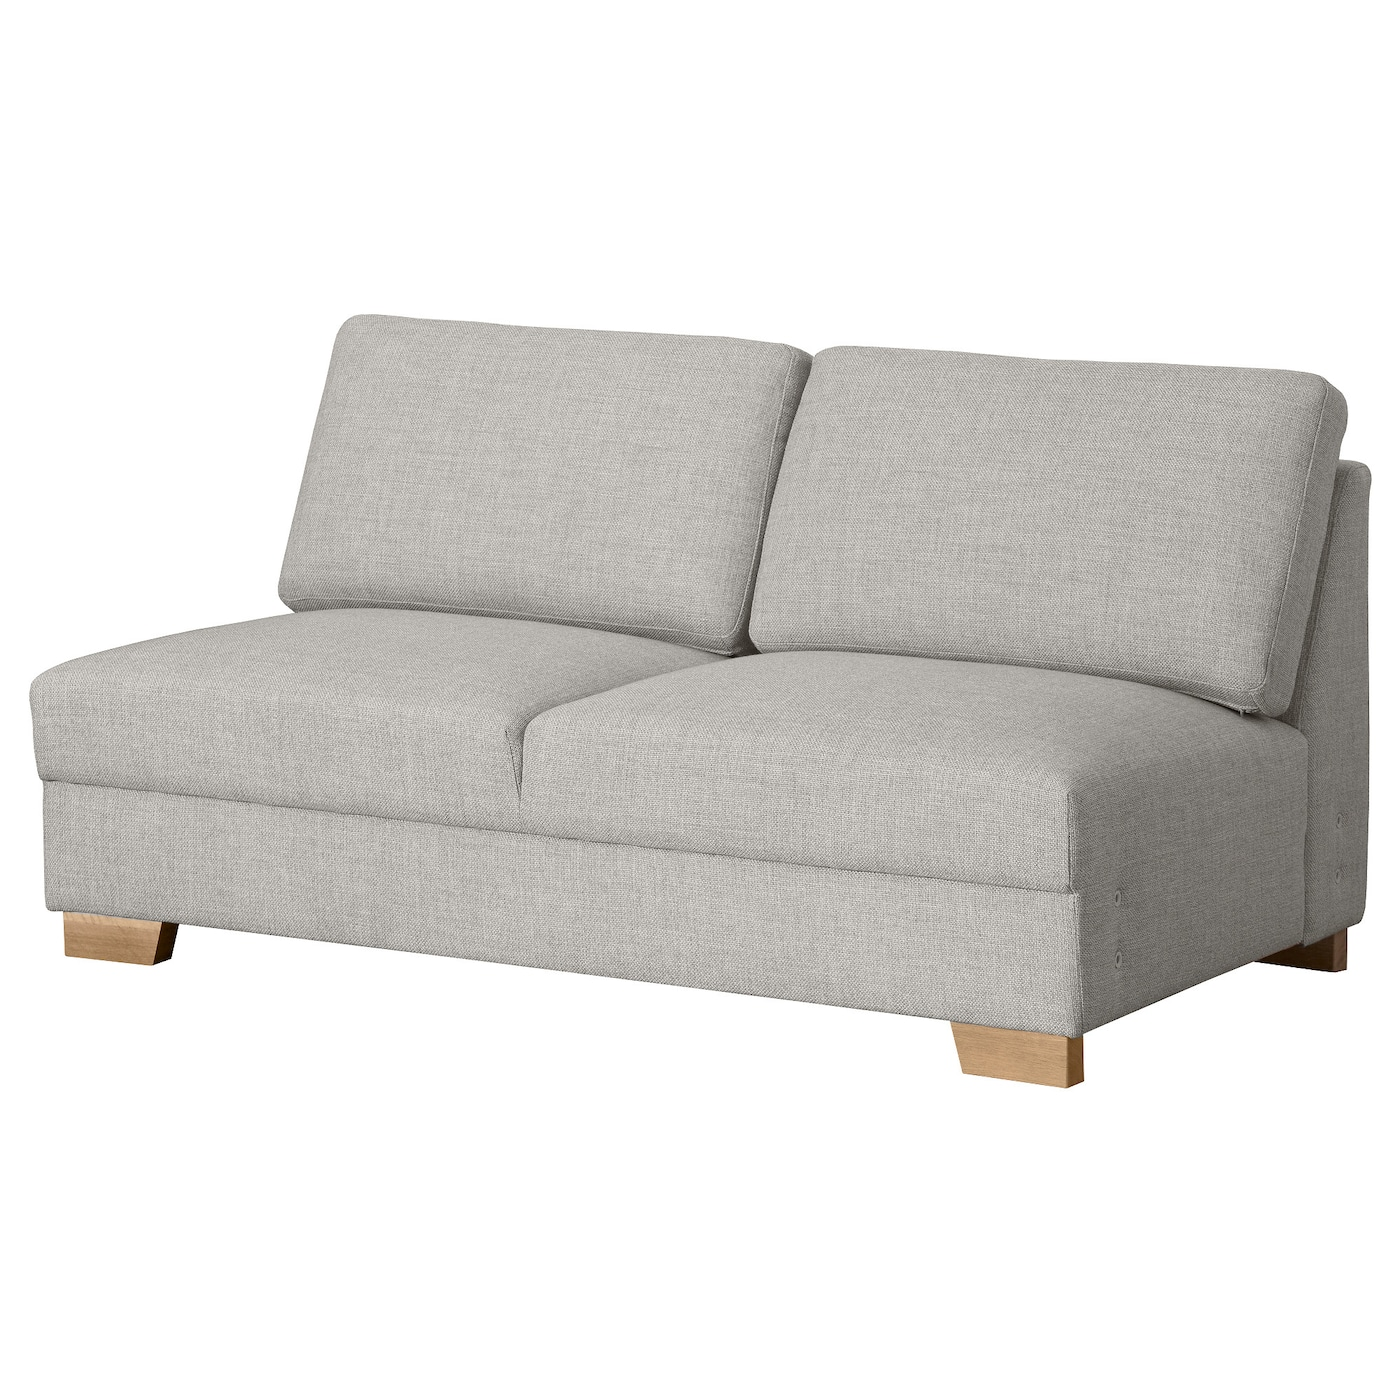 modulaire zitbank ikea. Black Bedroom Furniture Sets. Home Design Ideas